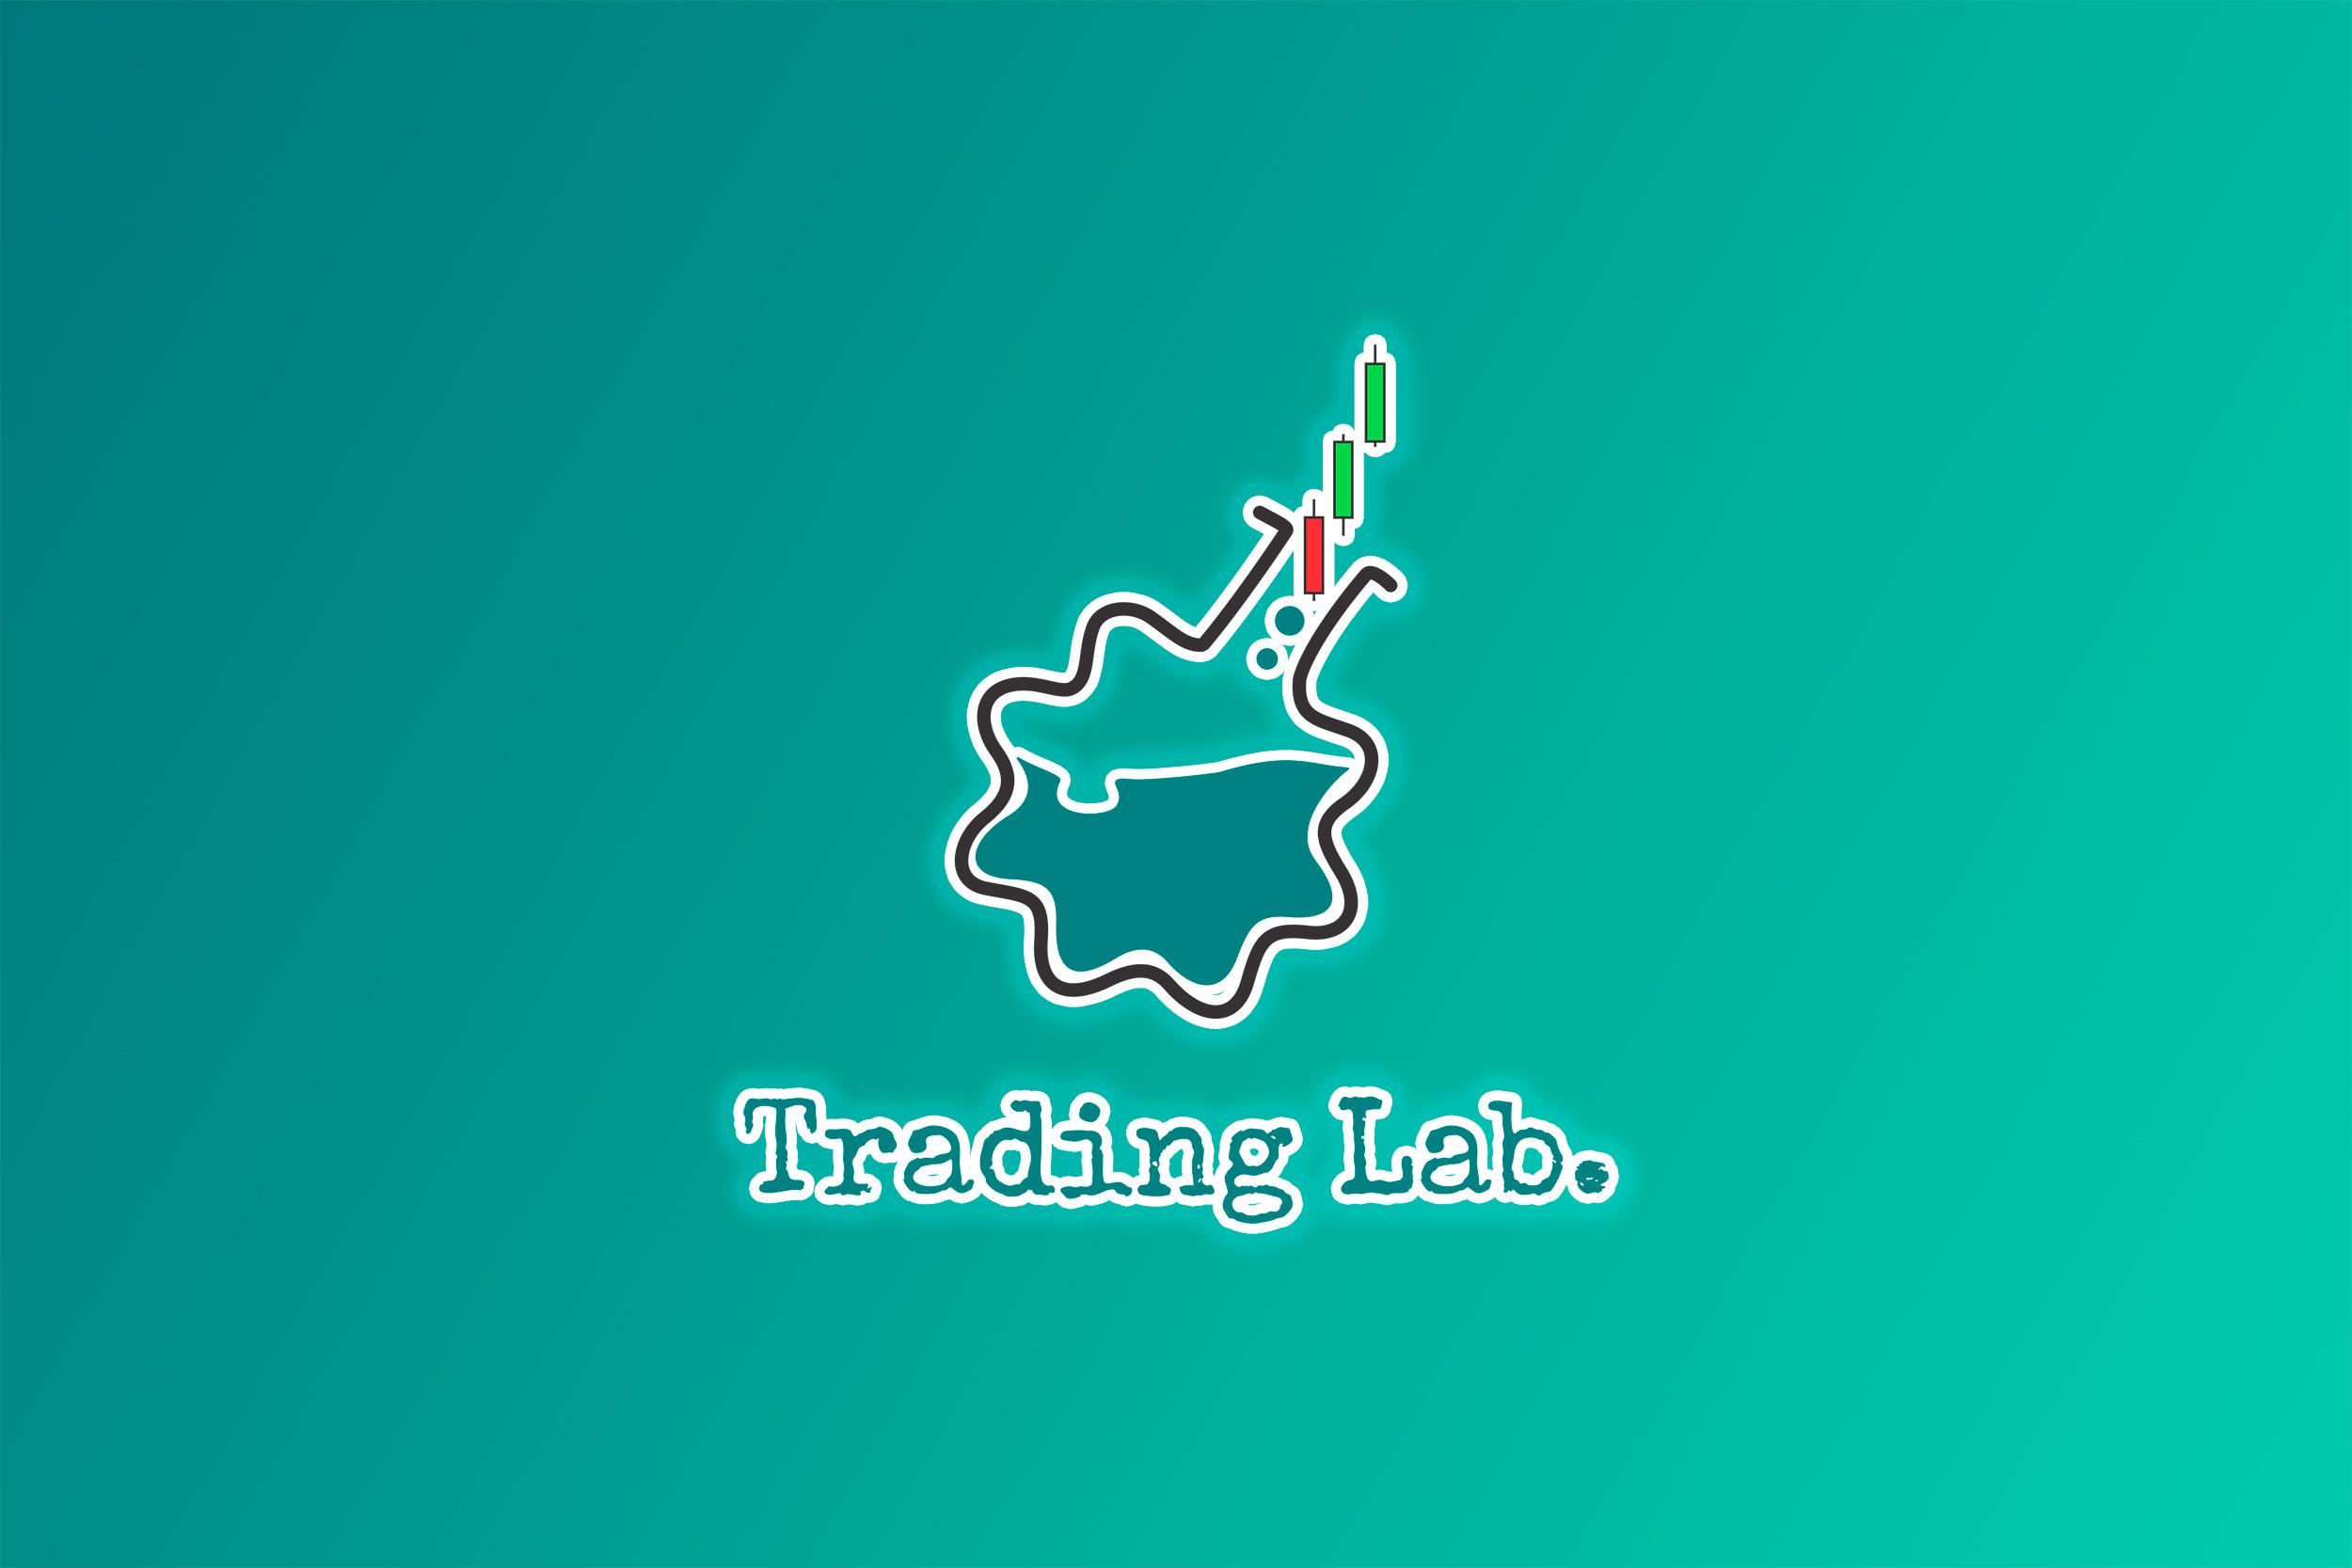 www.tradinglabproject.com